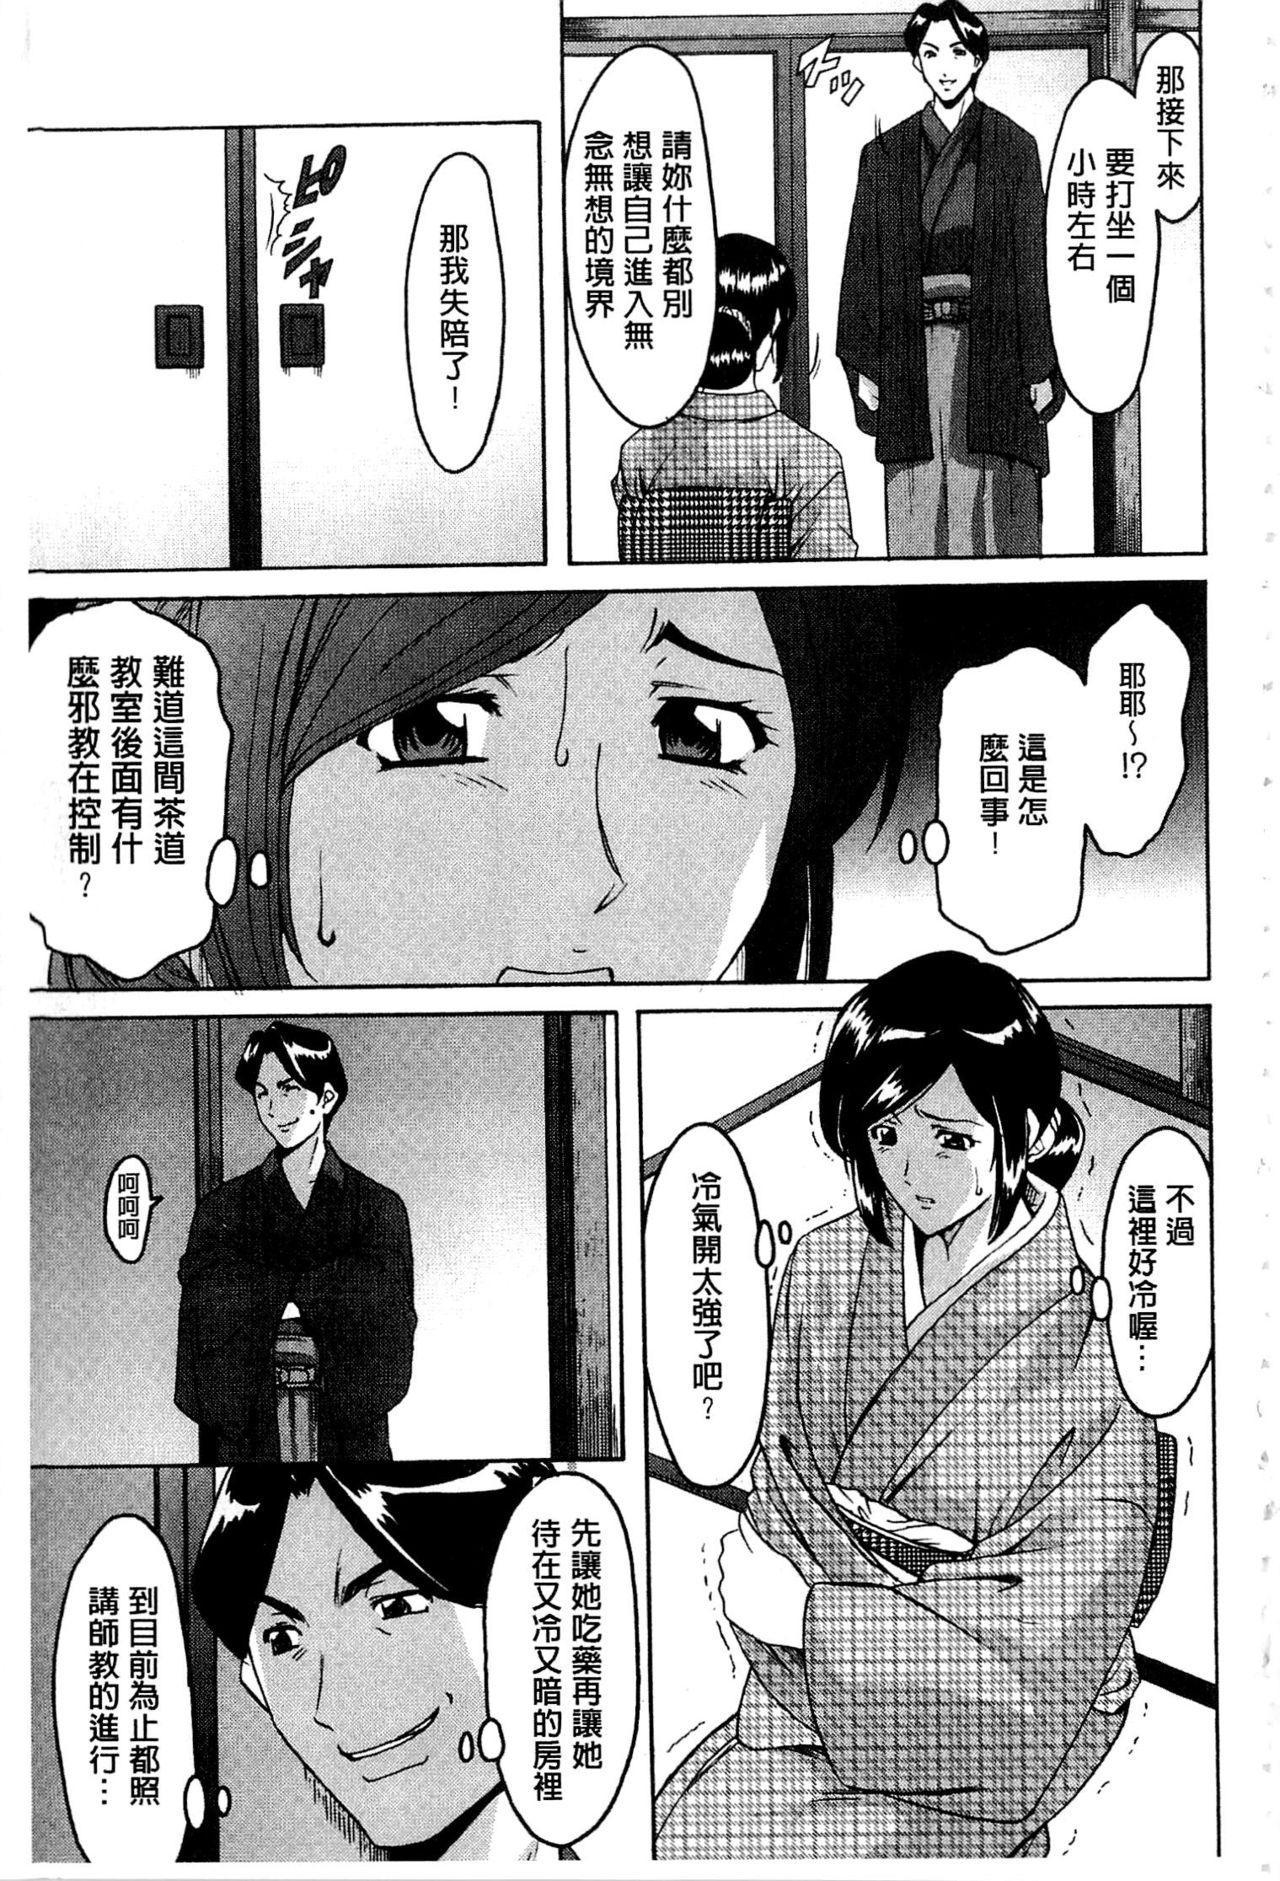 Sennyu Tsuma Satomi Kiroku | 臥底人妻里美 洗腦凌辱的記錄 上集 120